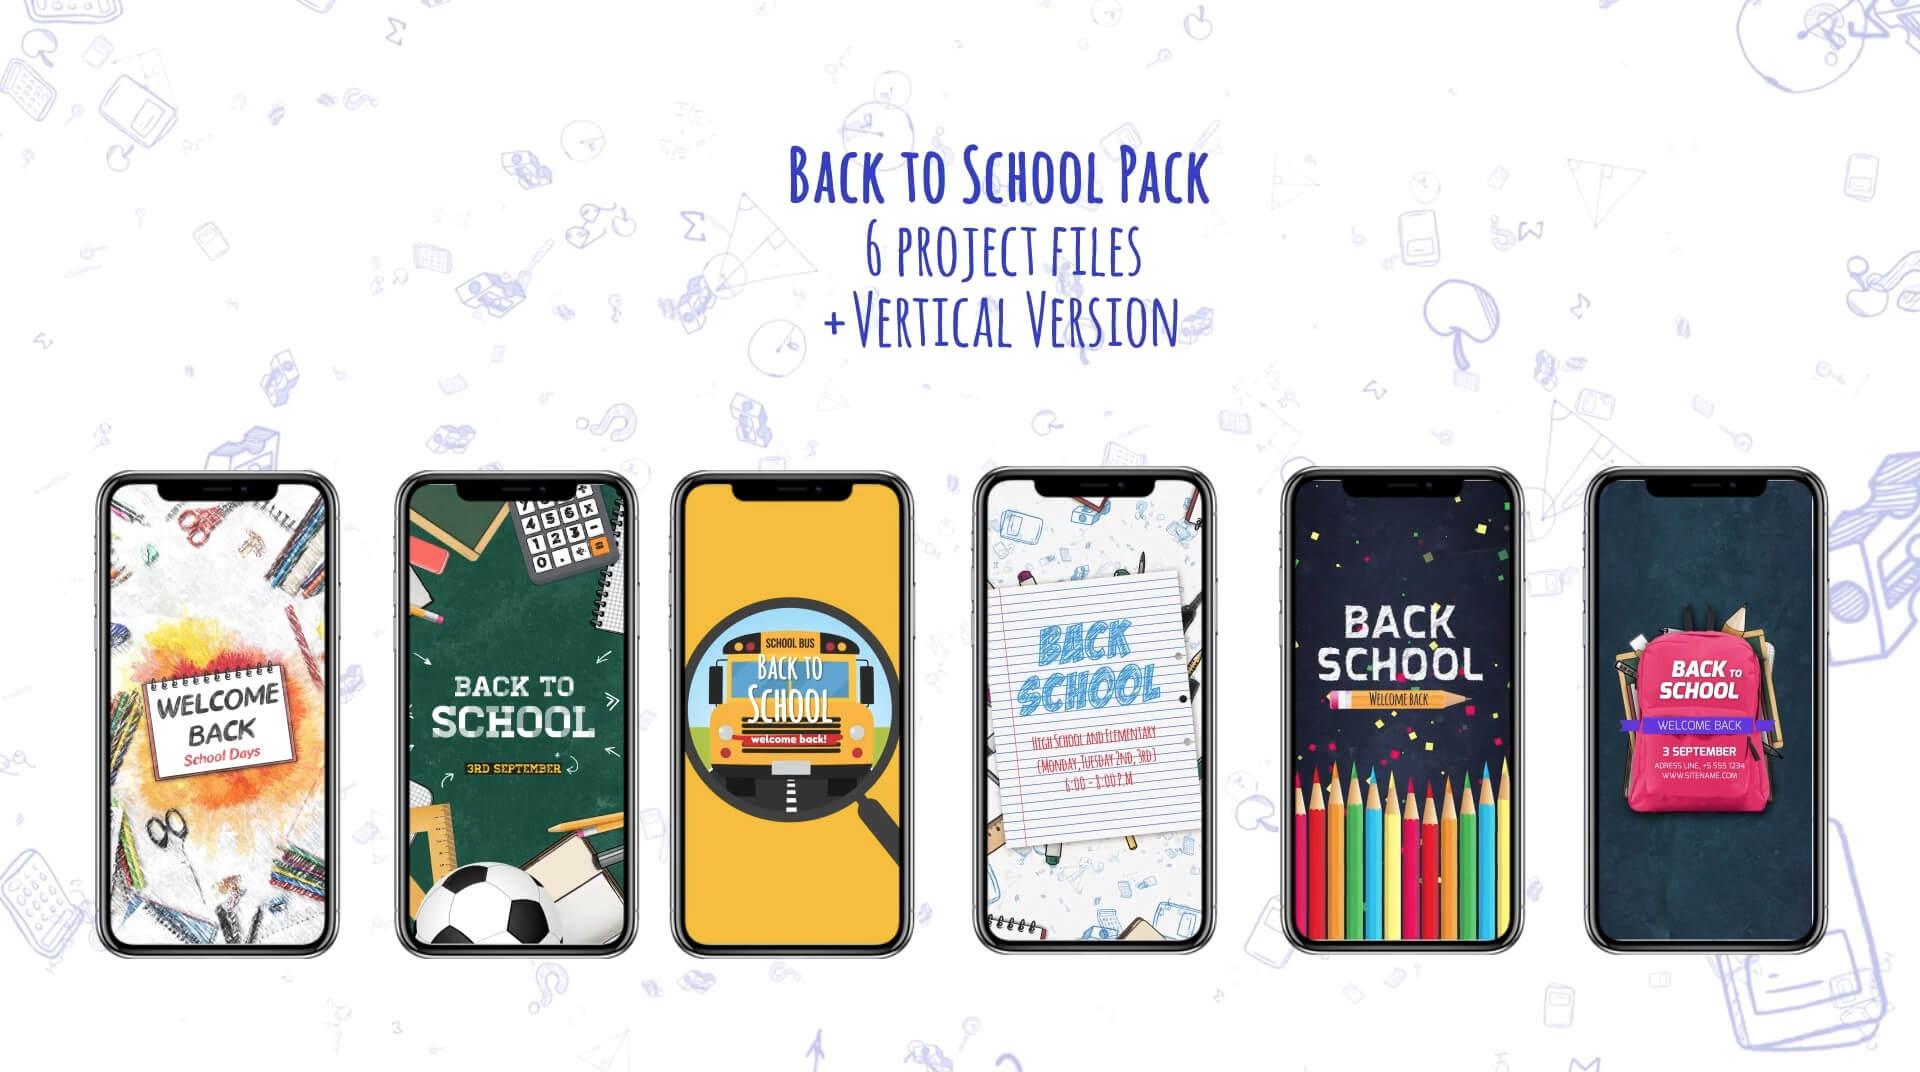 AE模板 返校开学季校园栏目包装片头 包含竖屏短视频模板